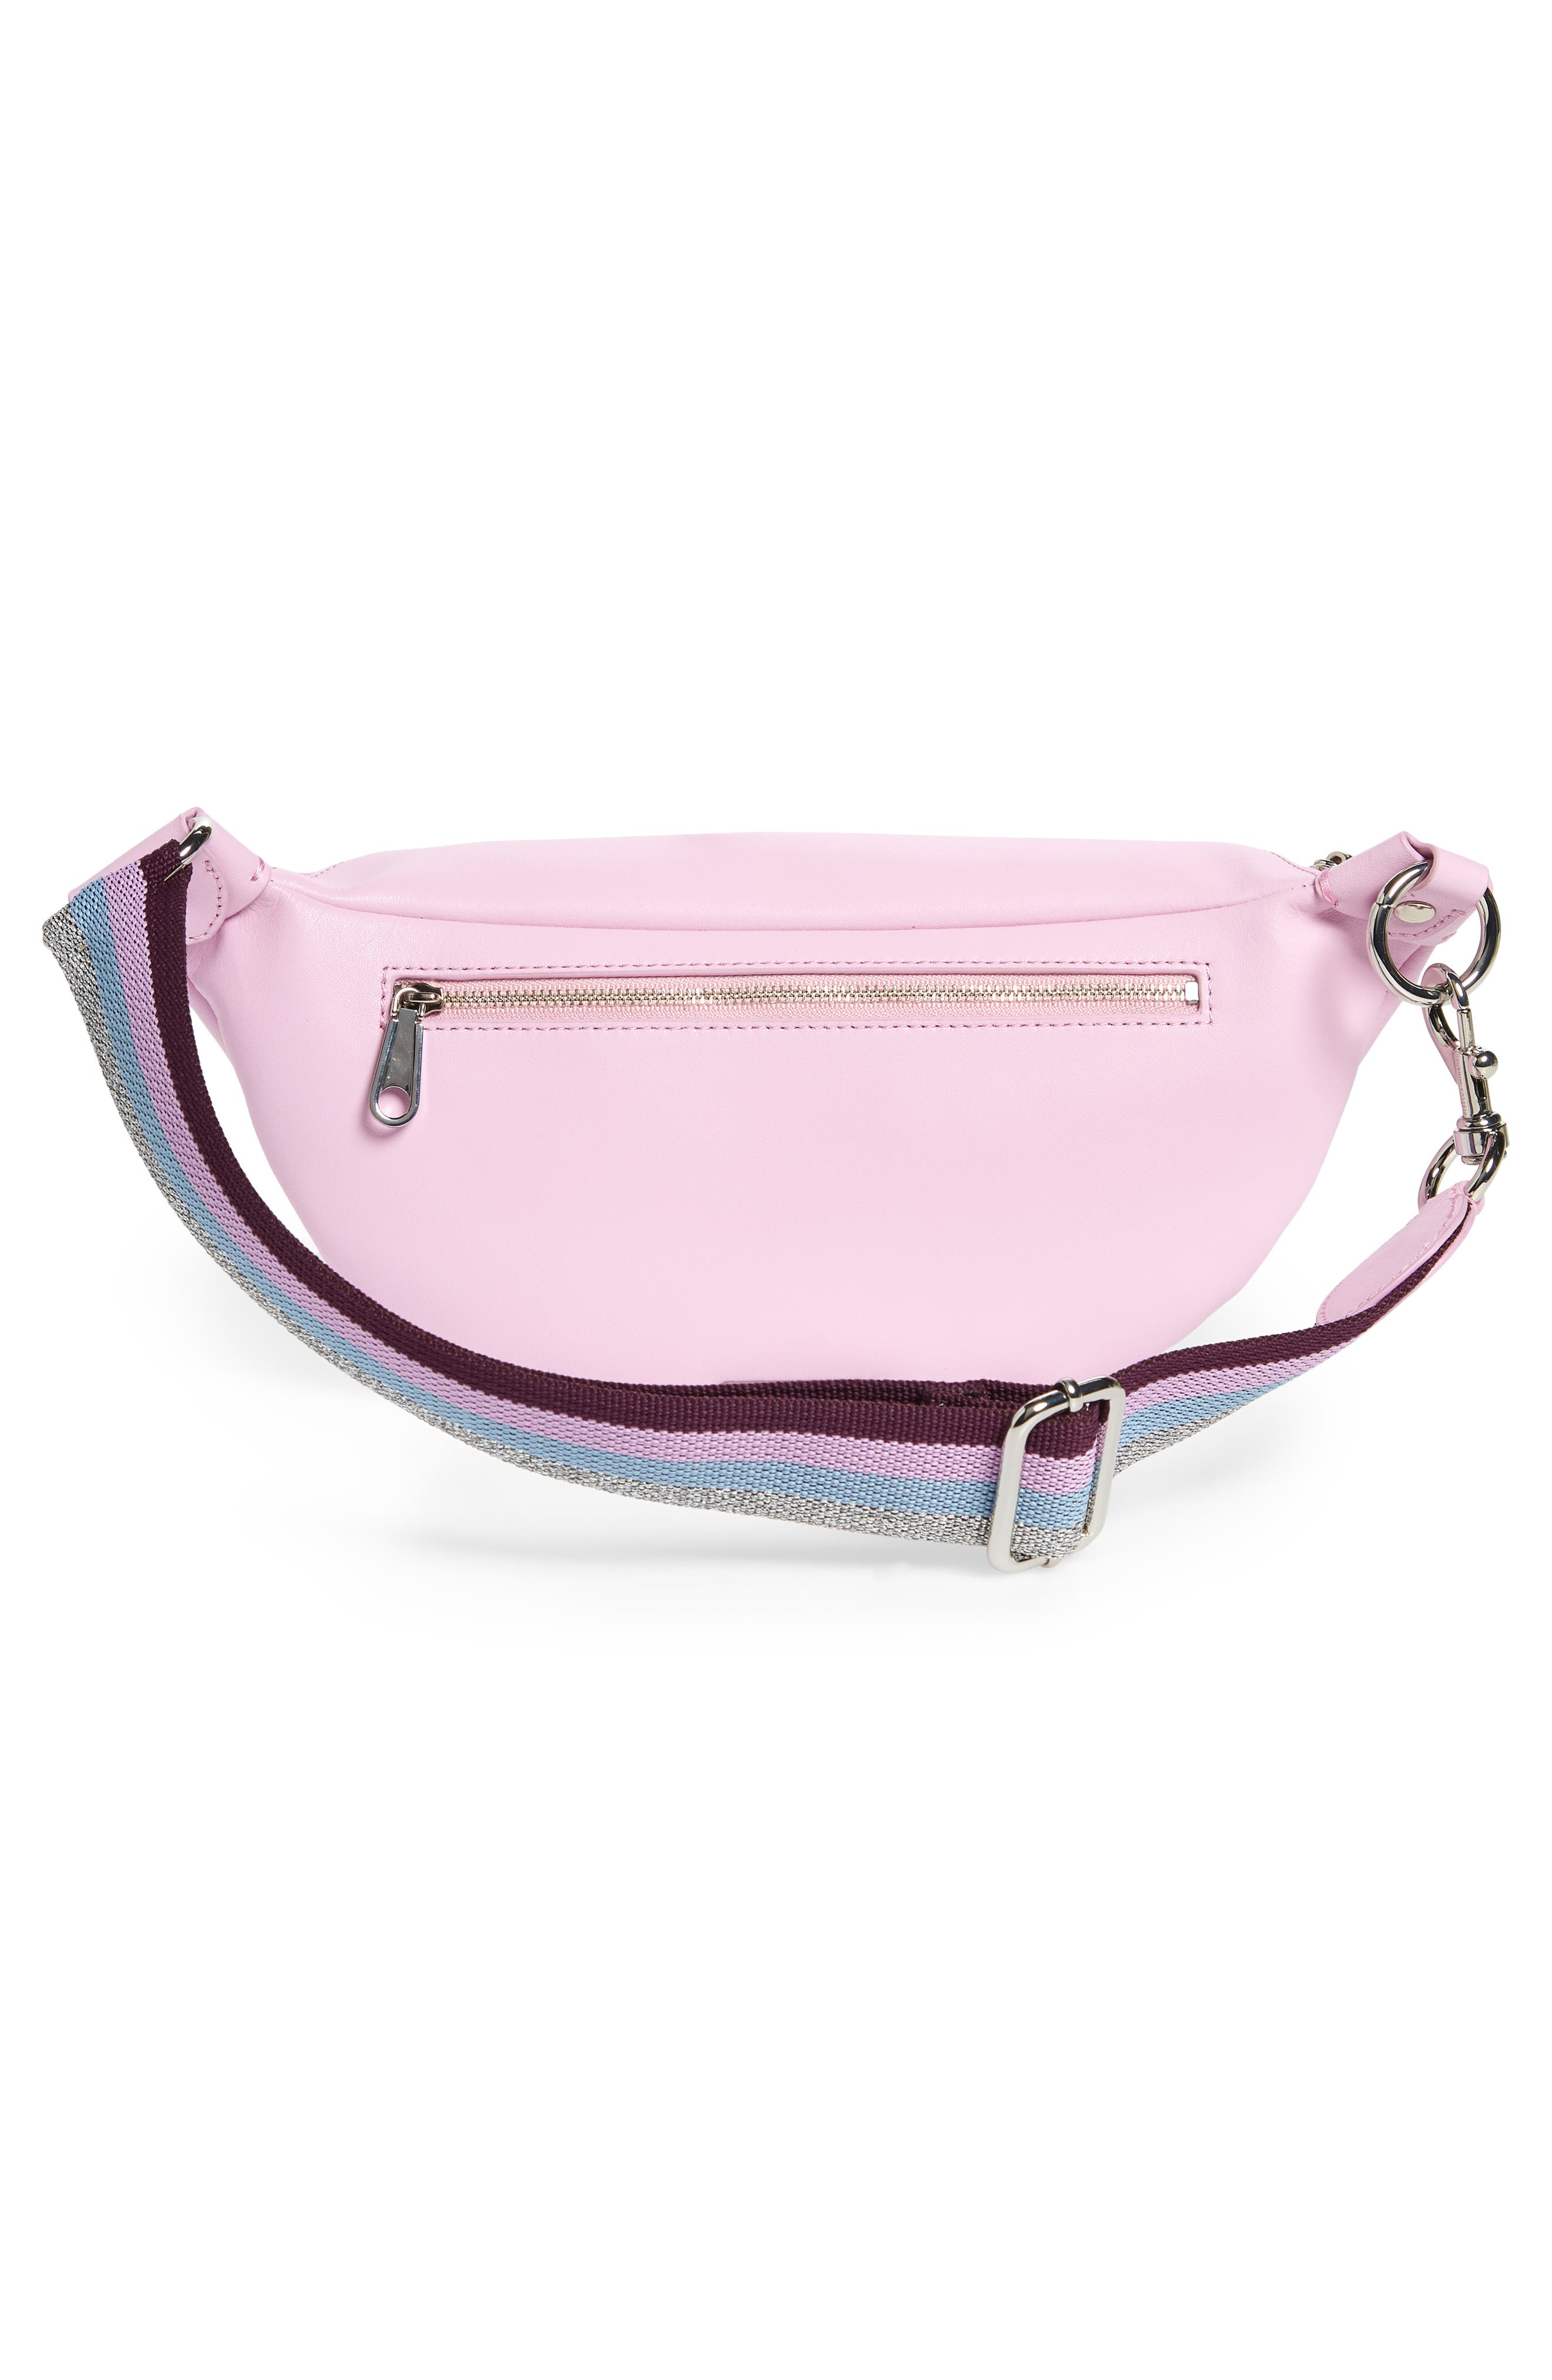 REBECCA MINKOFF,                             Bree - GRL PWR Leather Belt Bag,                             Alternate thumbnail 4, color,                             500